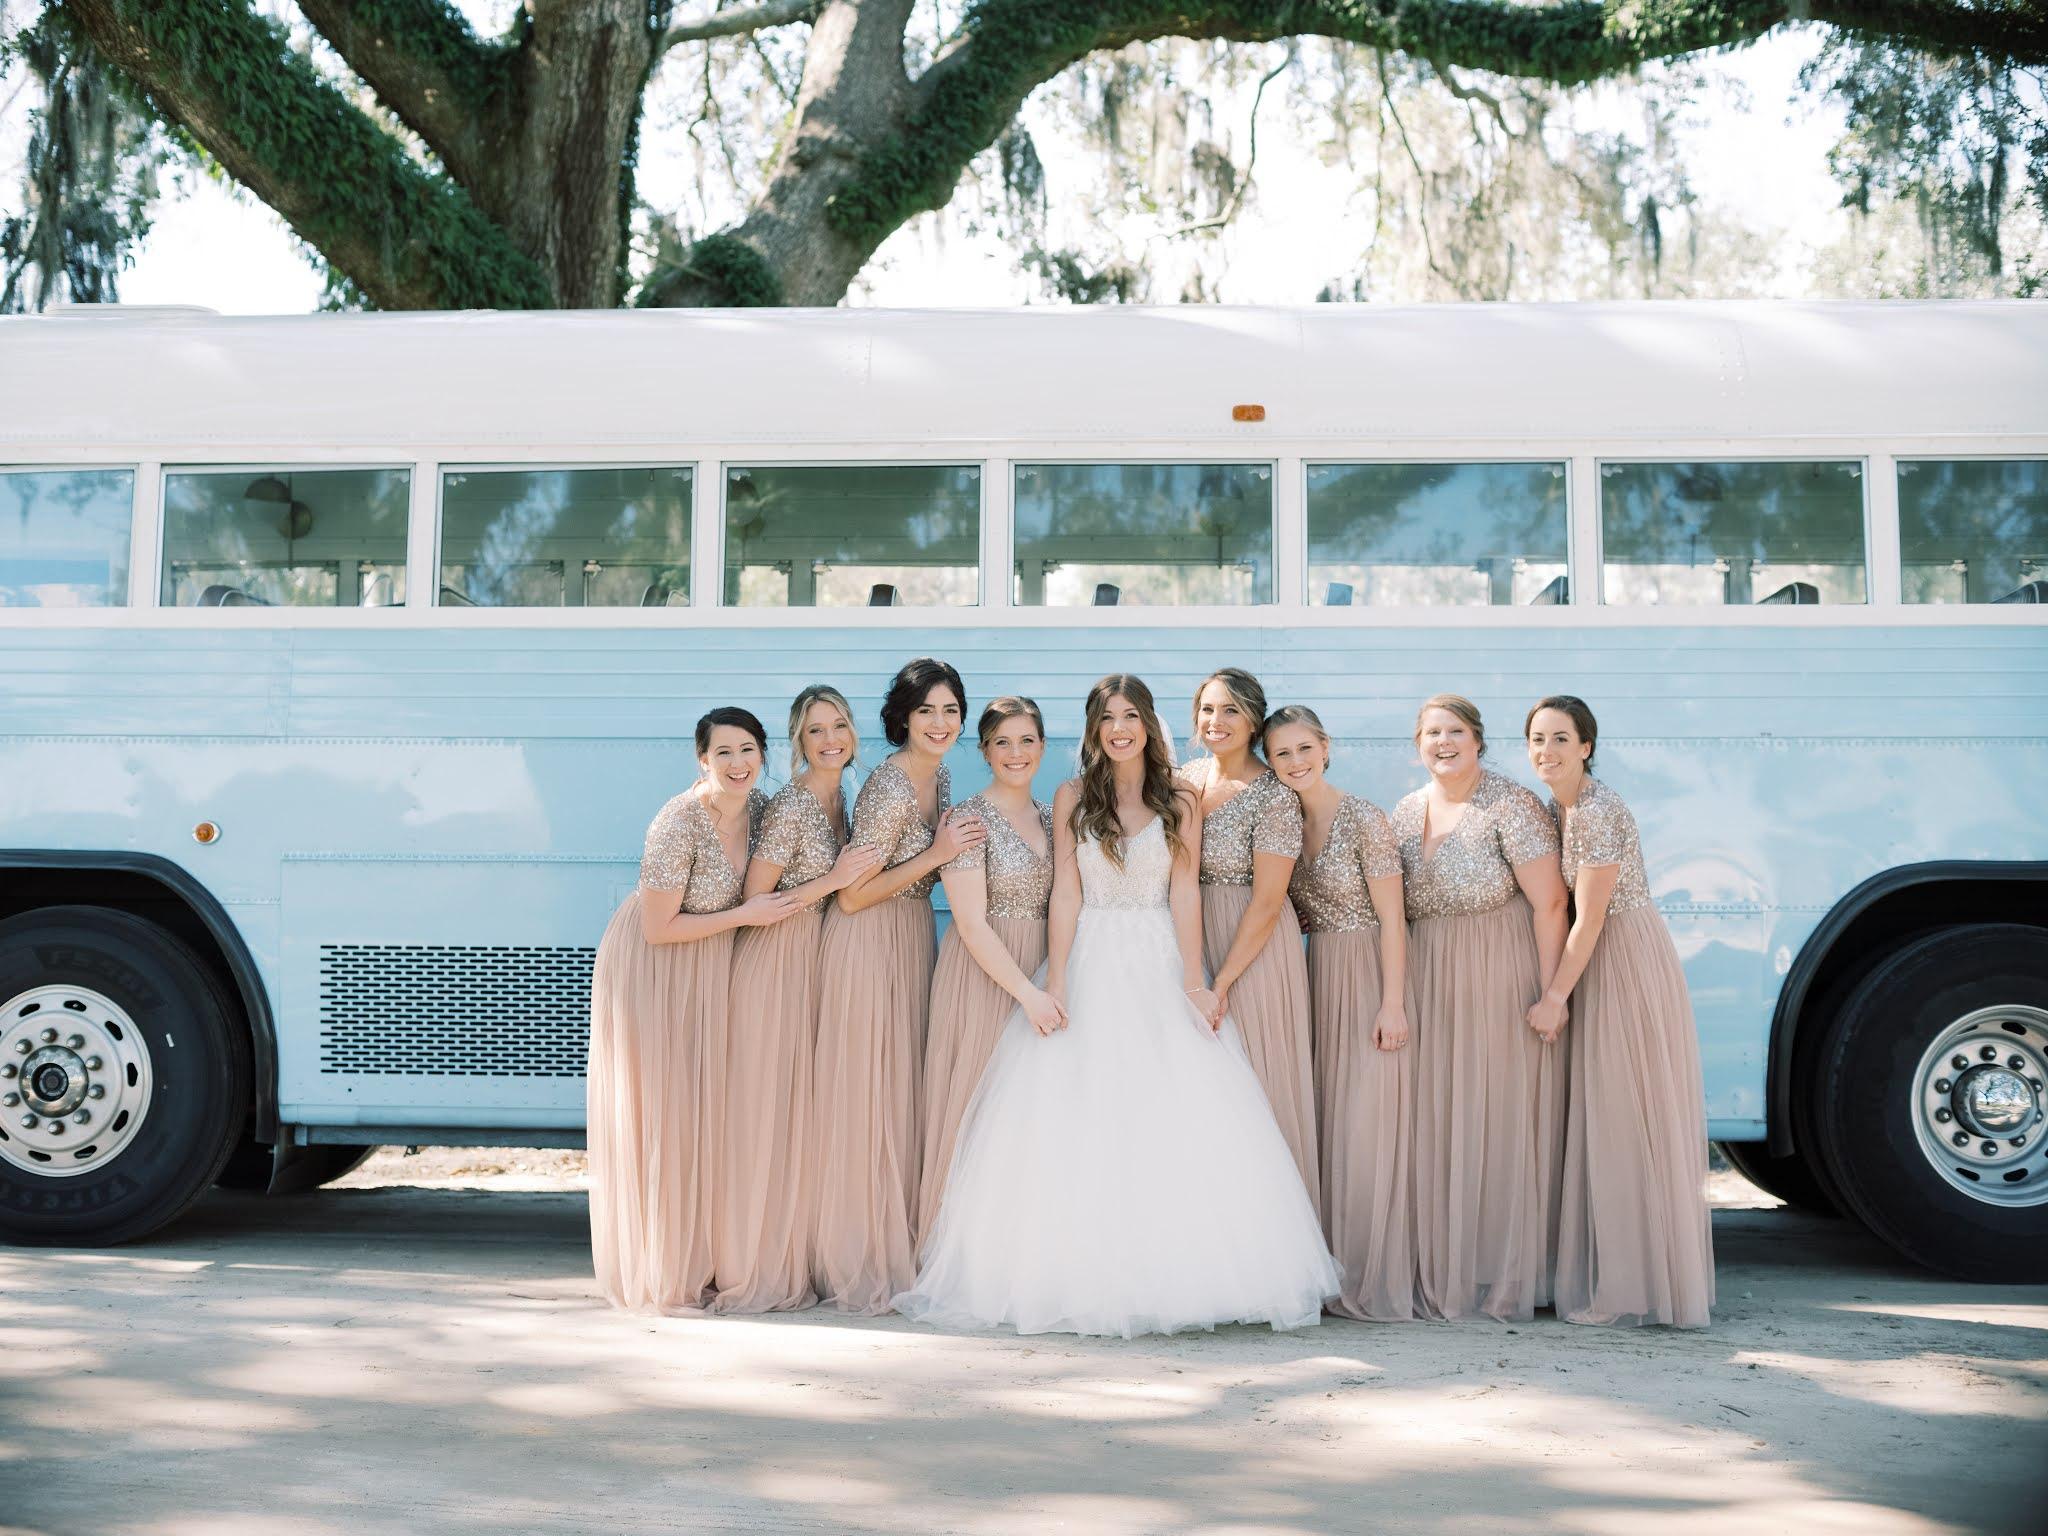 Wedding Transportation Charleston Lowcountry Valet - Chasing Cinderella